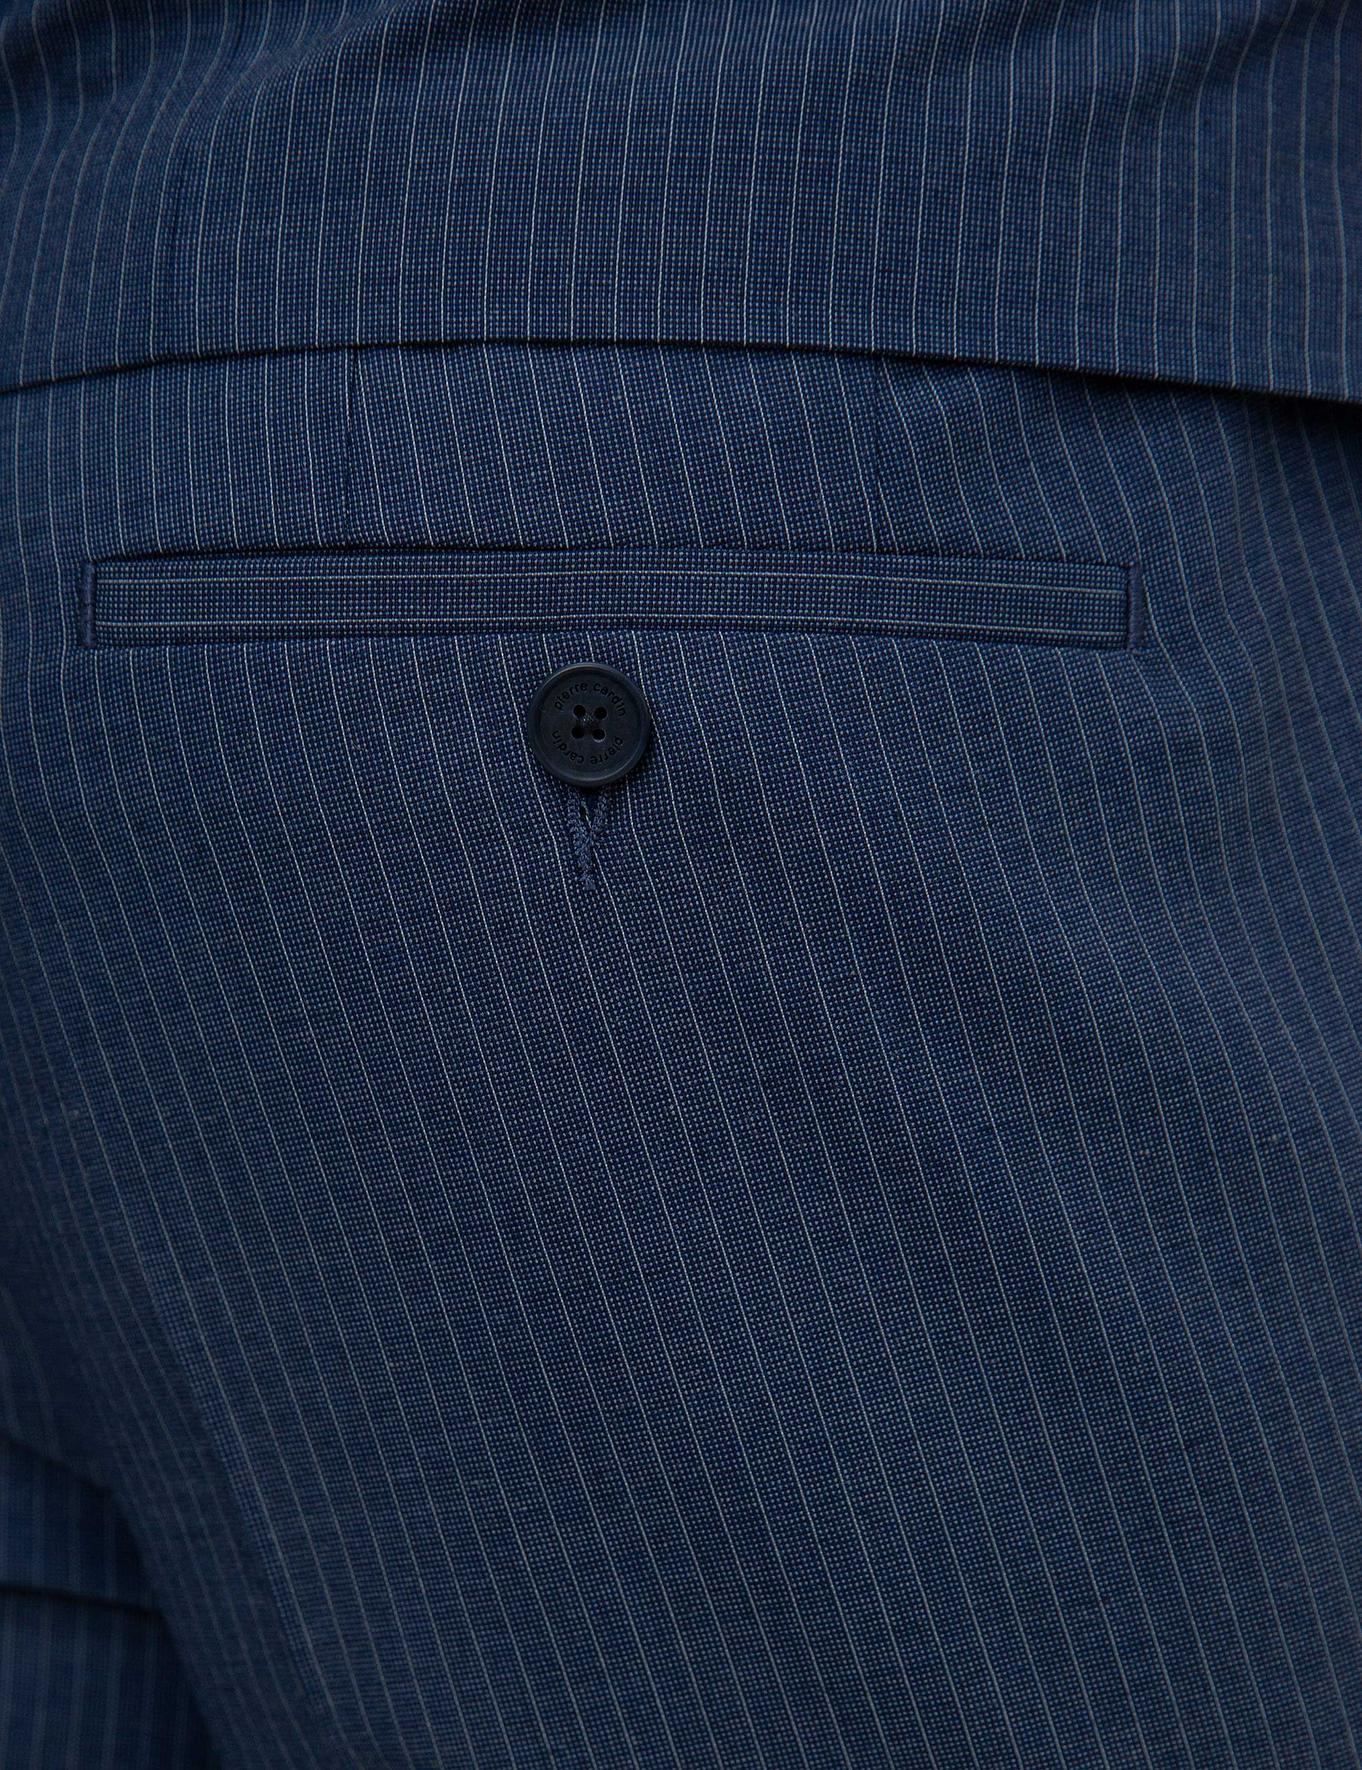 Koyu Mavi Slim Fit Takım Elbise